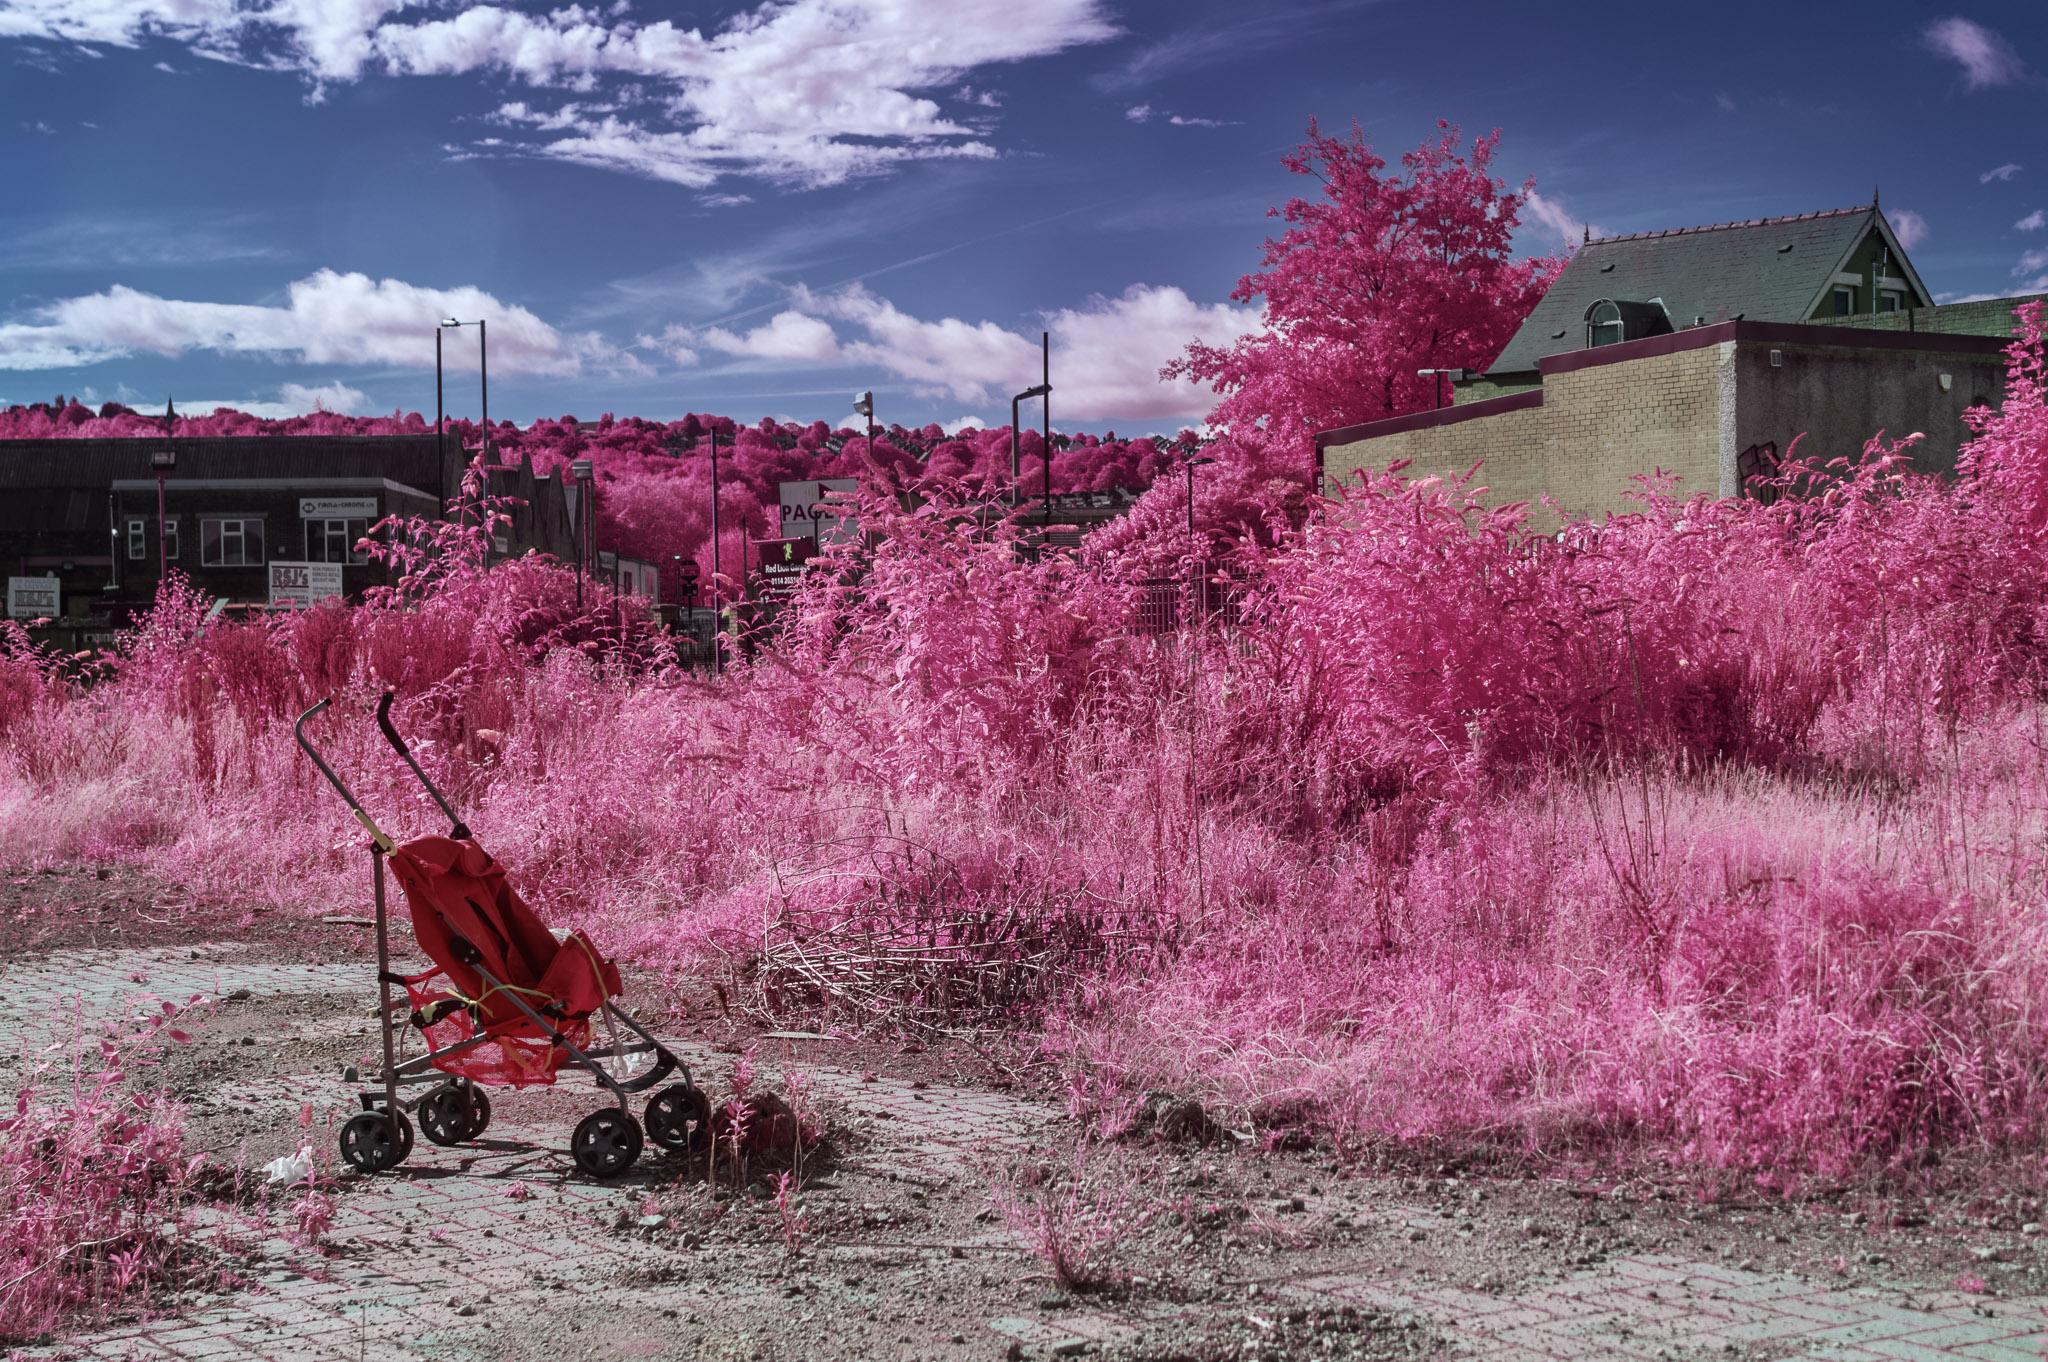 Kodak EIR Colour Infrared, Edgelands, Wasteland, Out of sight,  Push chair, Stroller, ©Jonny Sutton